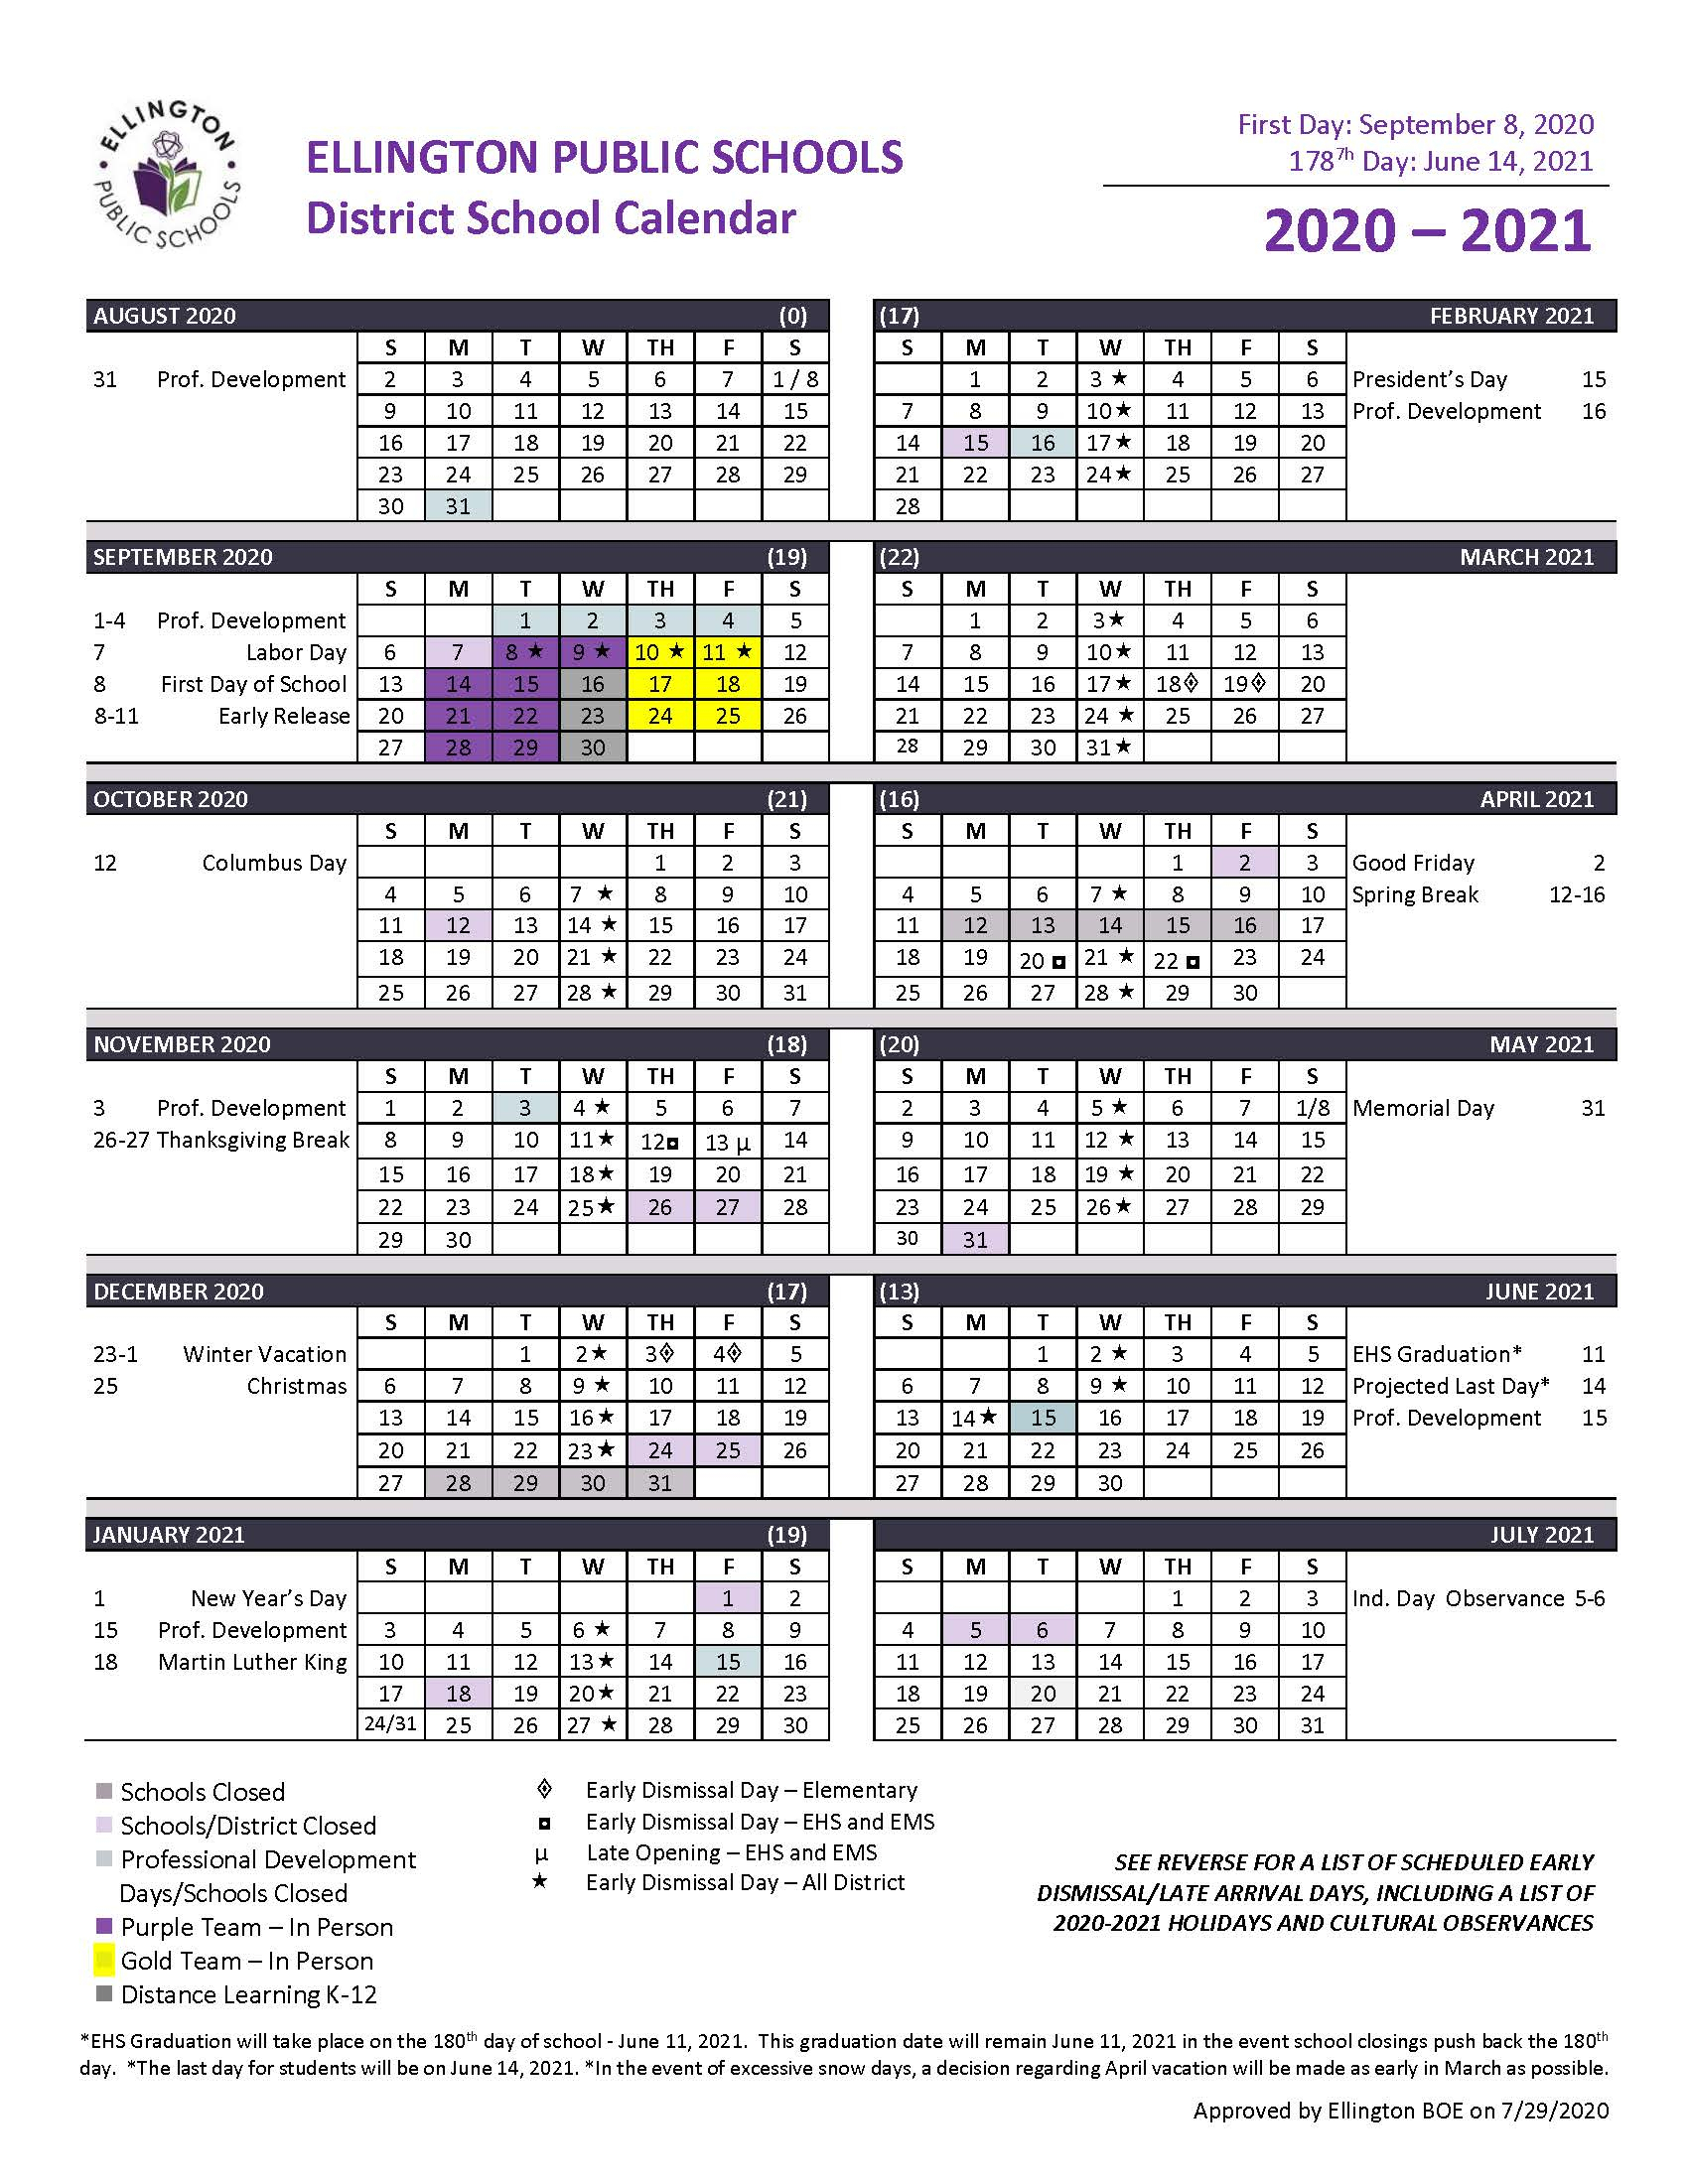 Yearly Calendar And School Hours - Ellington Public Schools